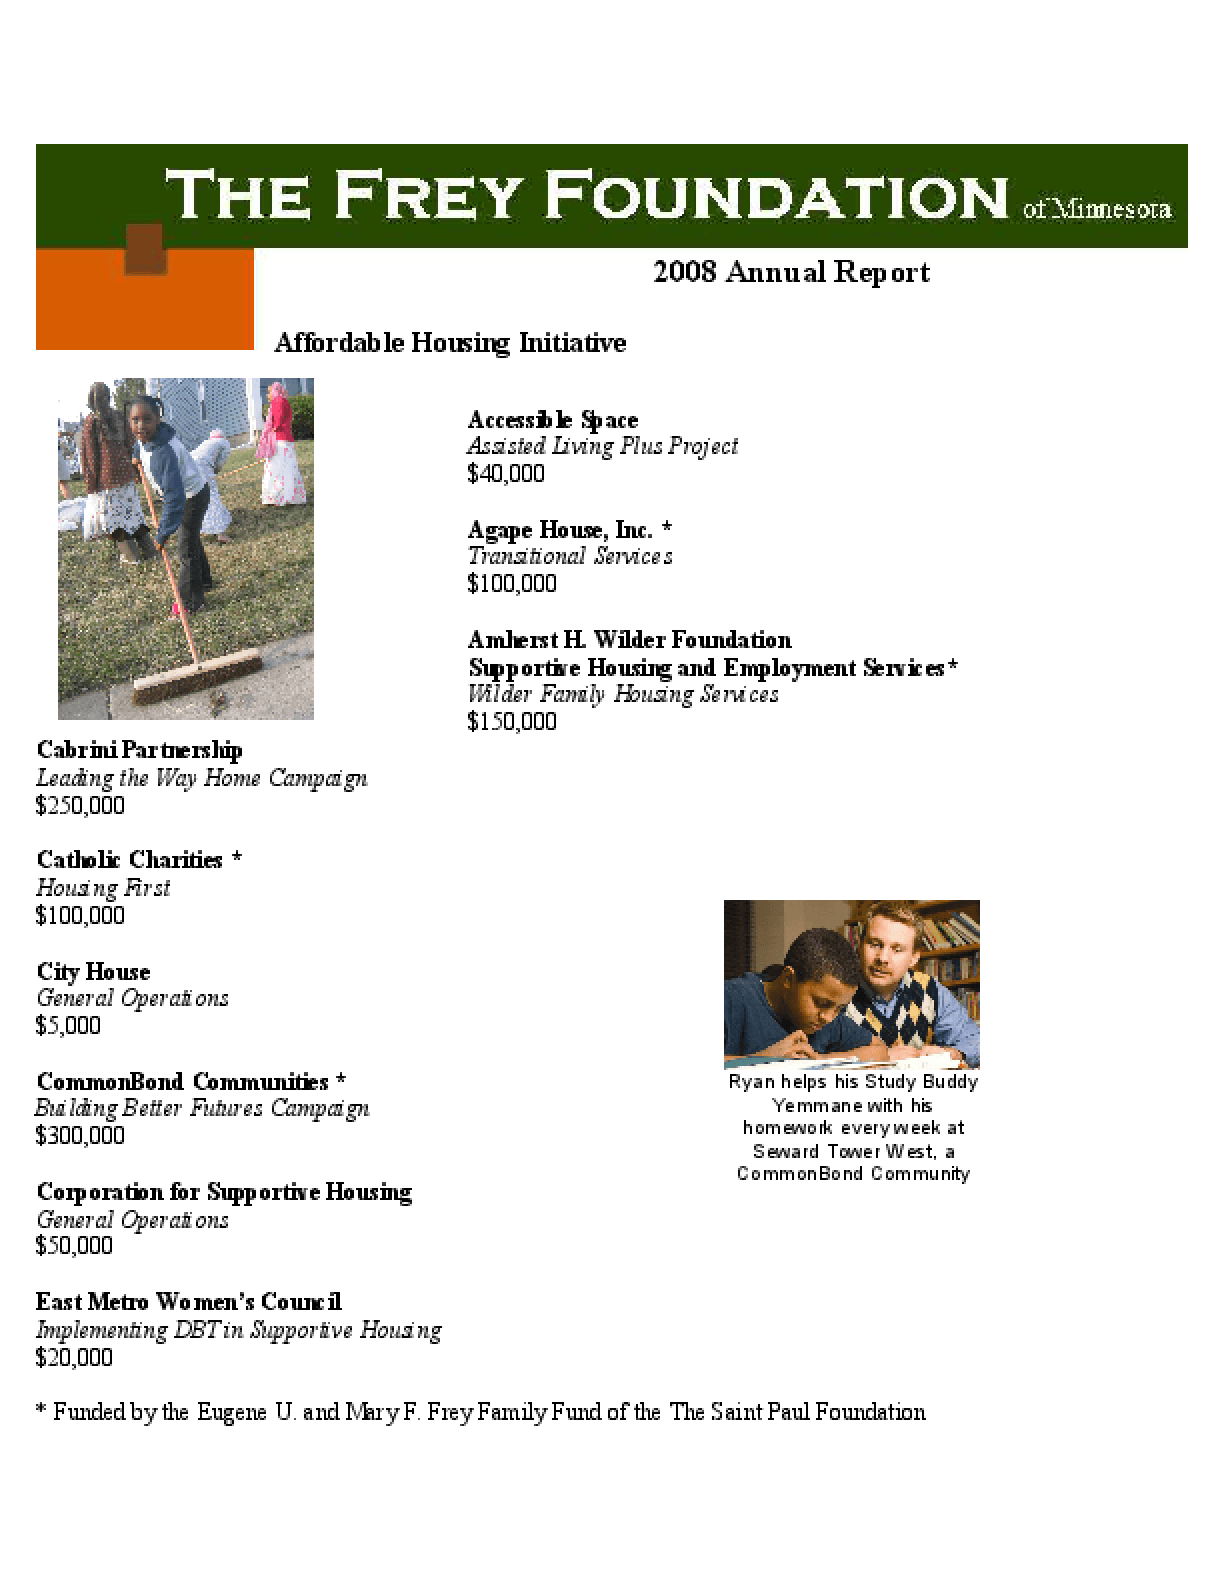 Frey Foundation - 2008 Annual Report